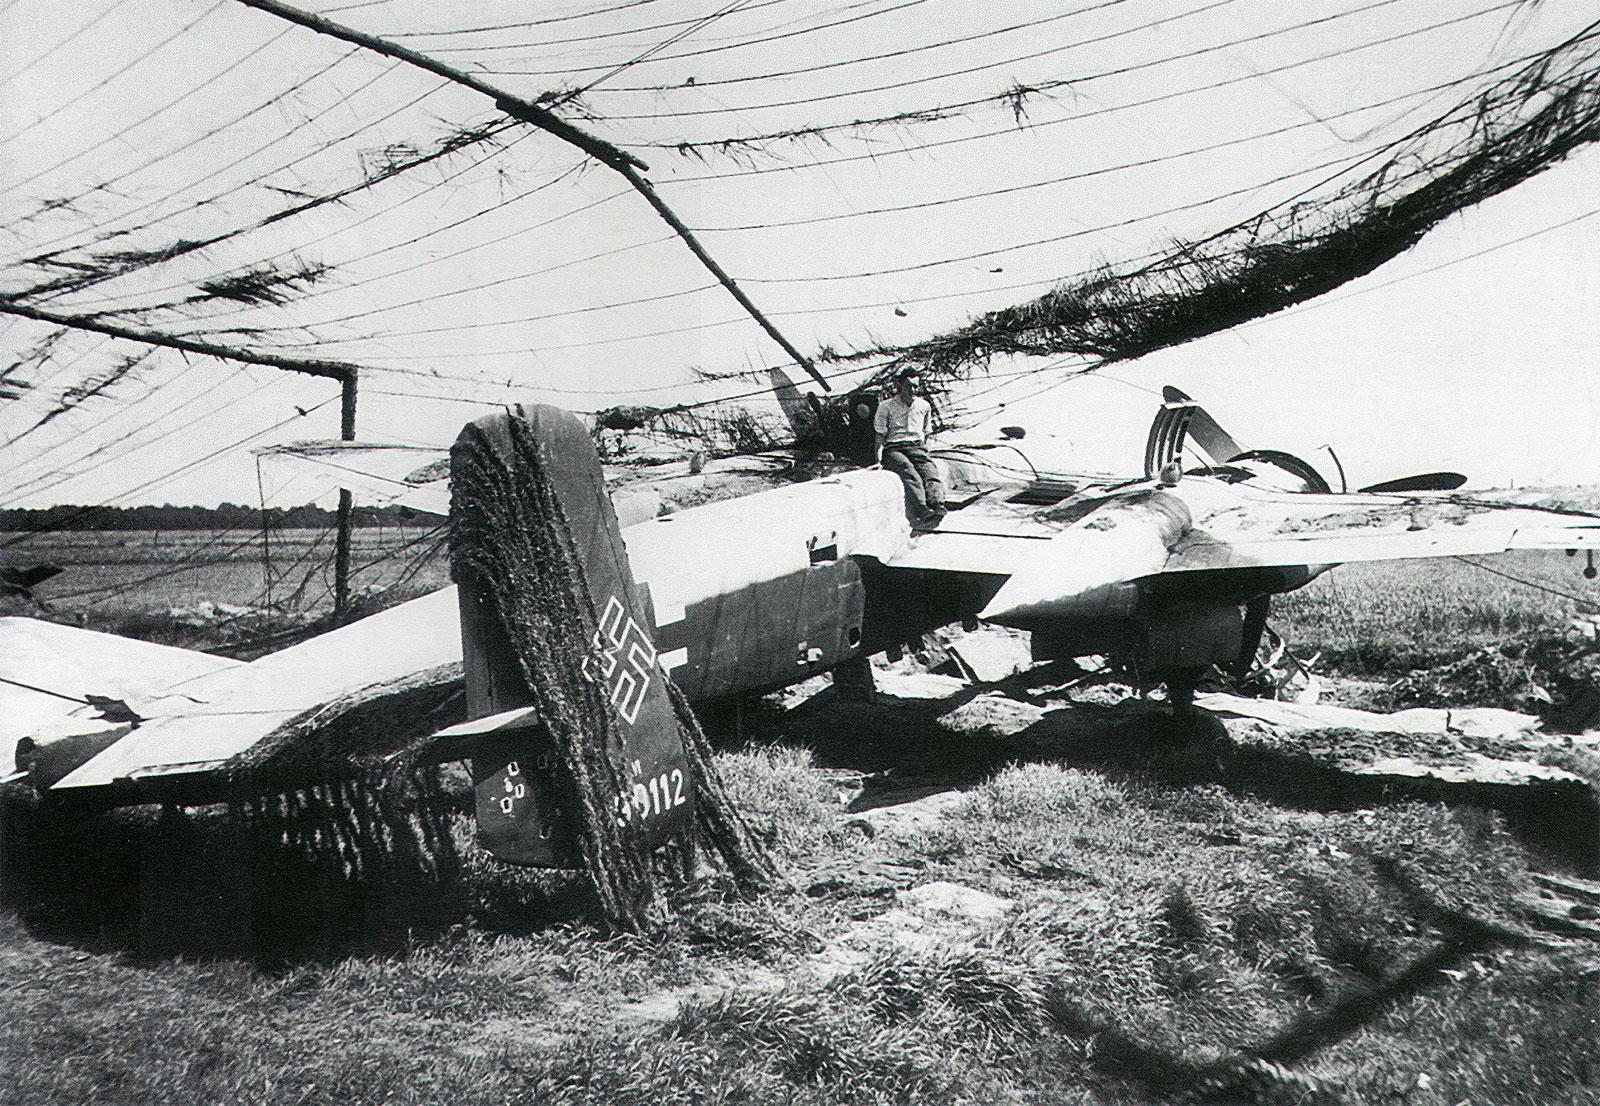 Heinkel He 219A NJG WNr 290112 Hildesheim 01